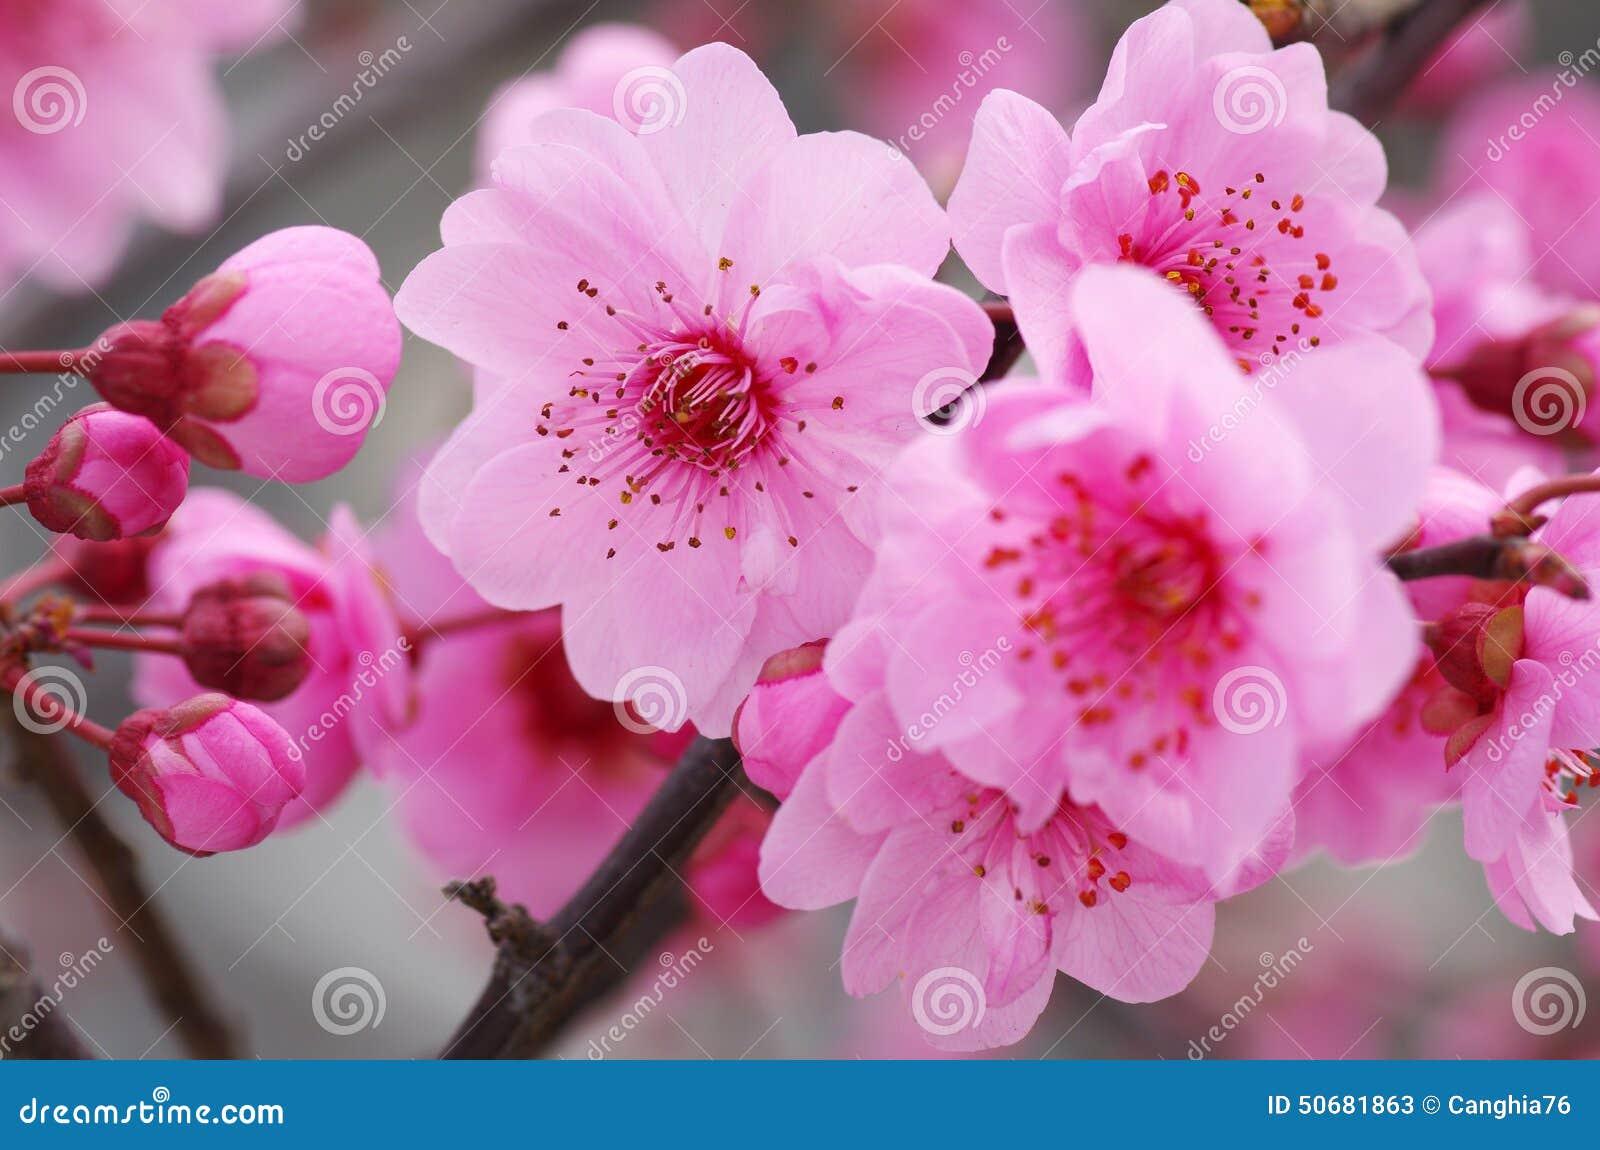 Download 李子花开花 库存图片. 图片 包括有 空白, 新鲜, 自然, 开花, brander, 五颜六色, 格式 - 50681863